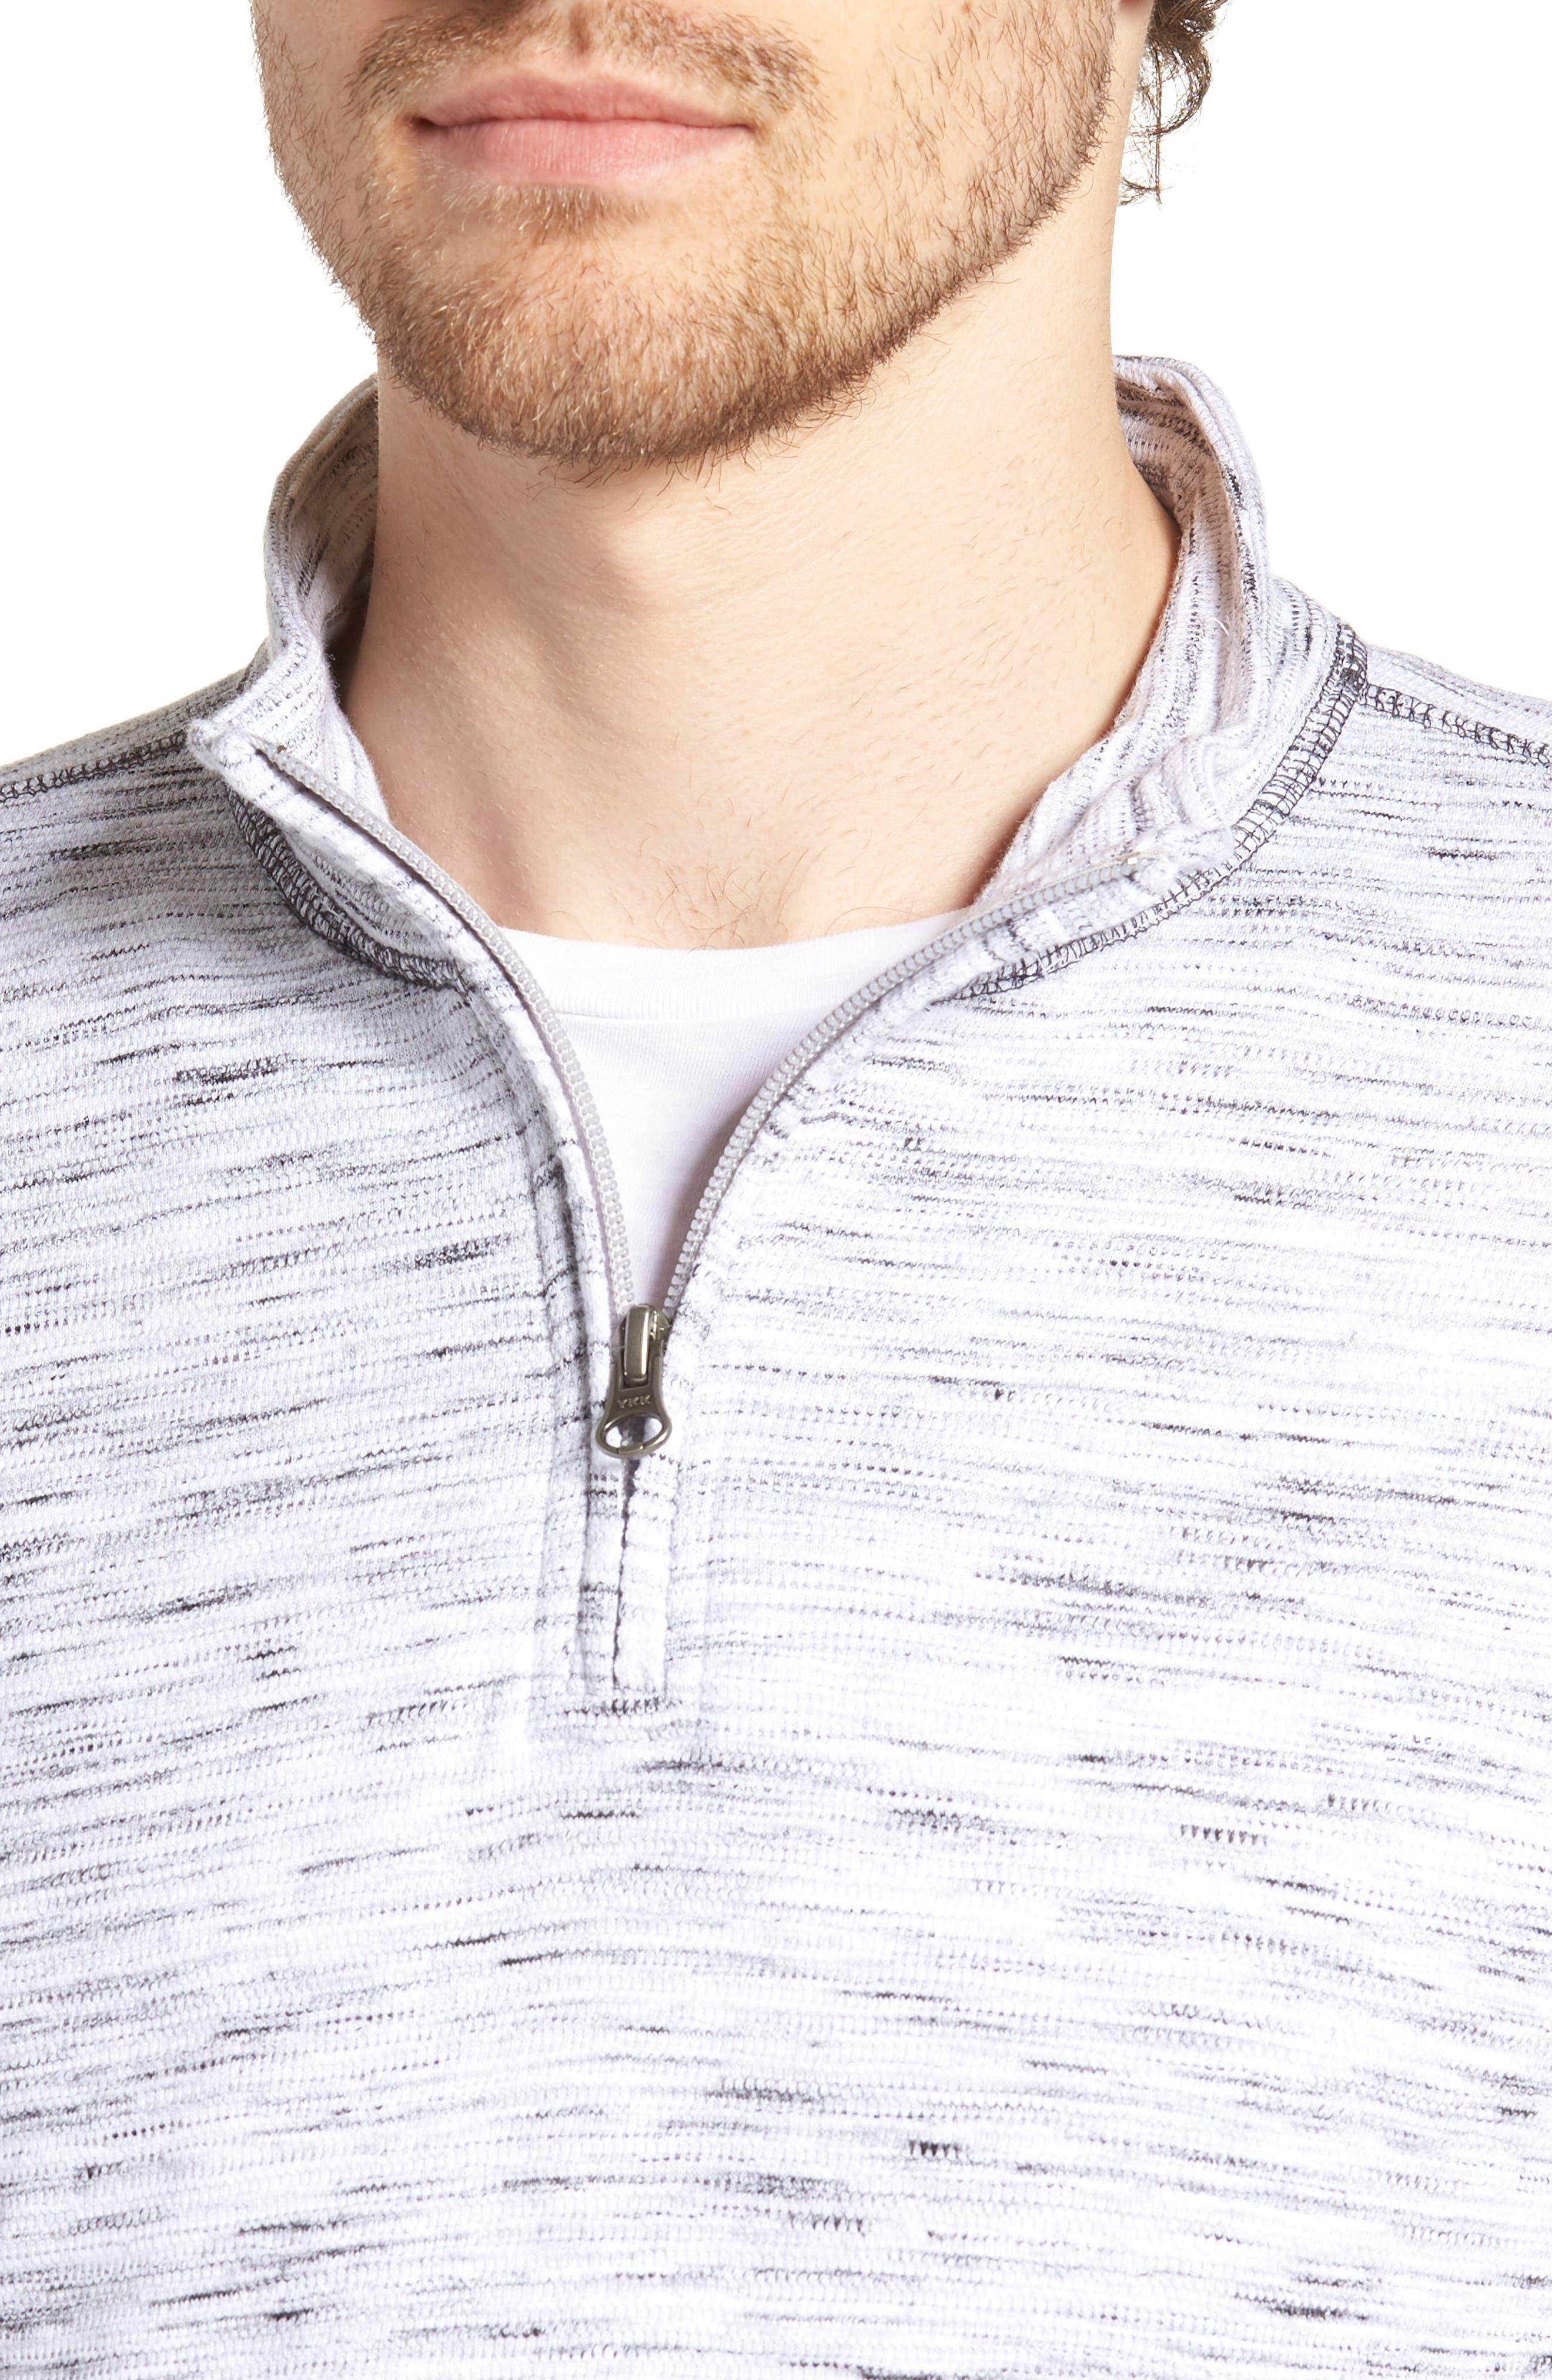 Regular Fit Jacquard Quarter Zip Shirt,                             Alternate thumbnail 4, color,                             270